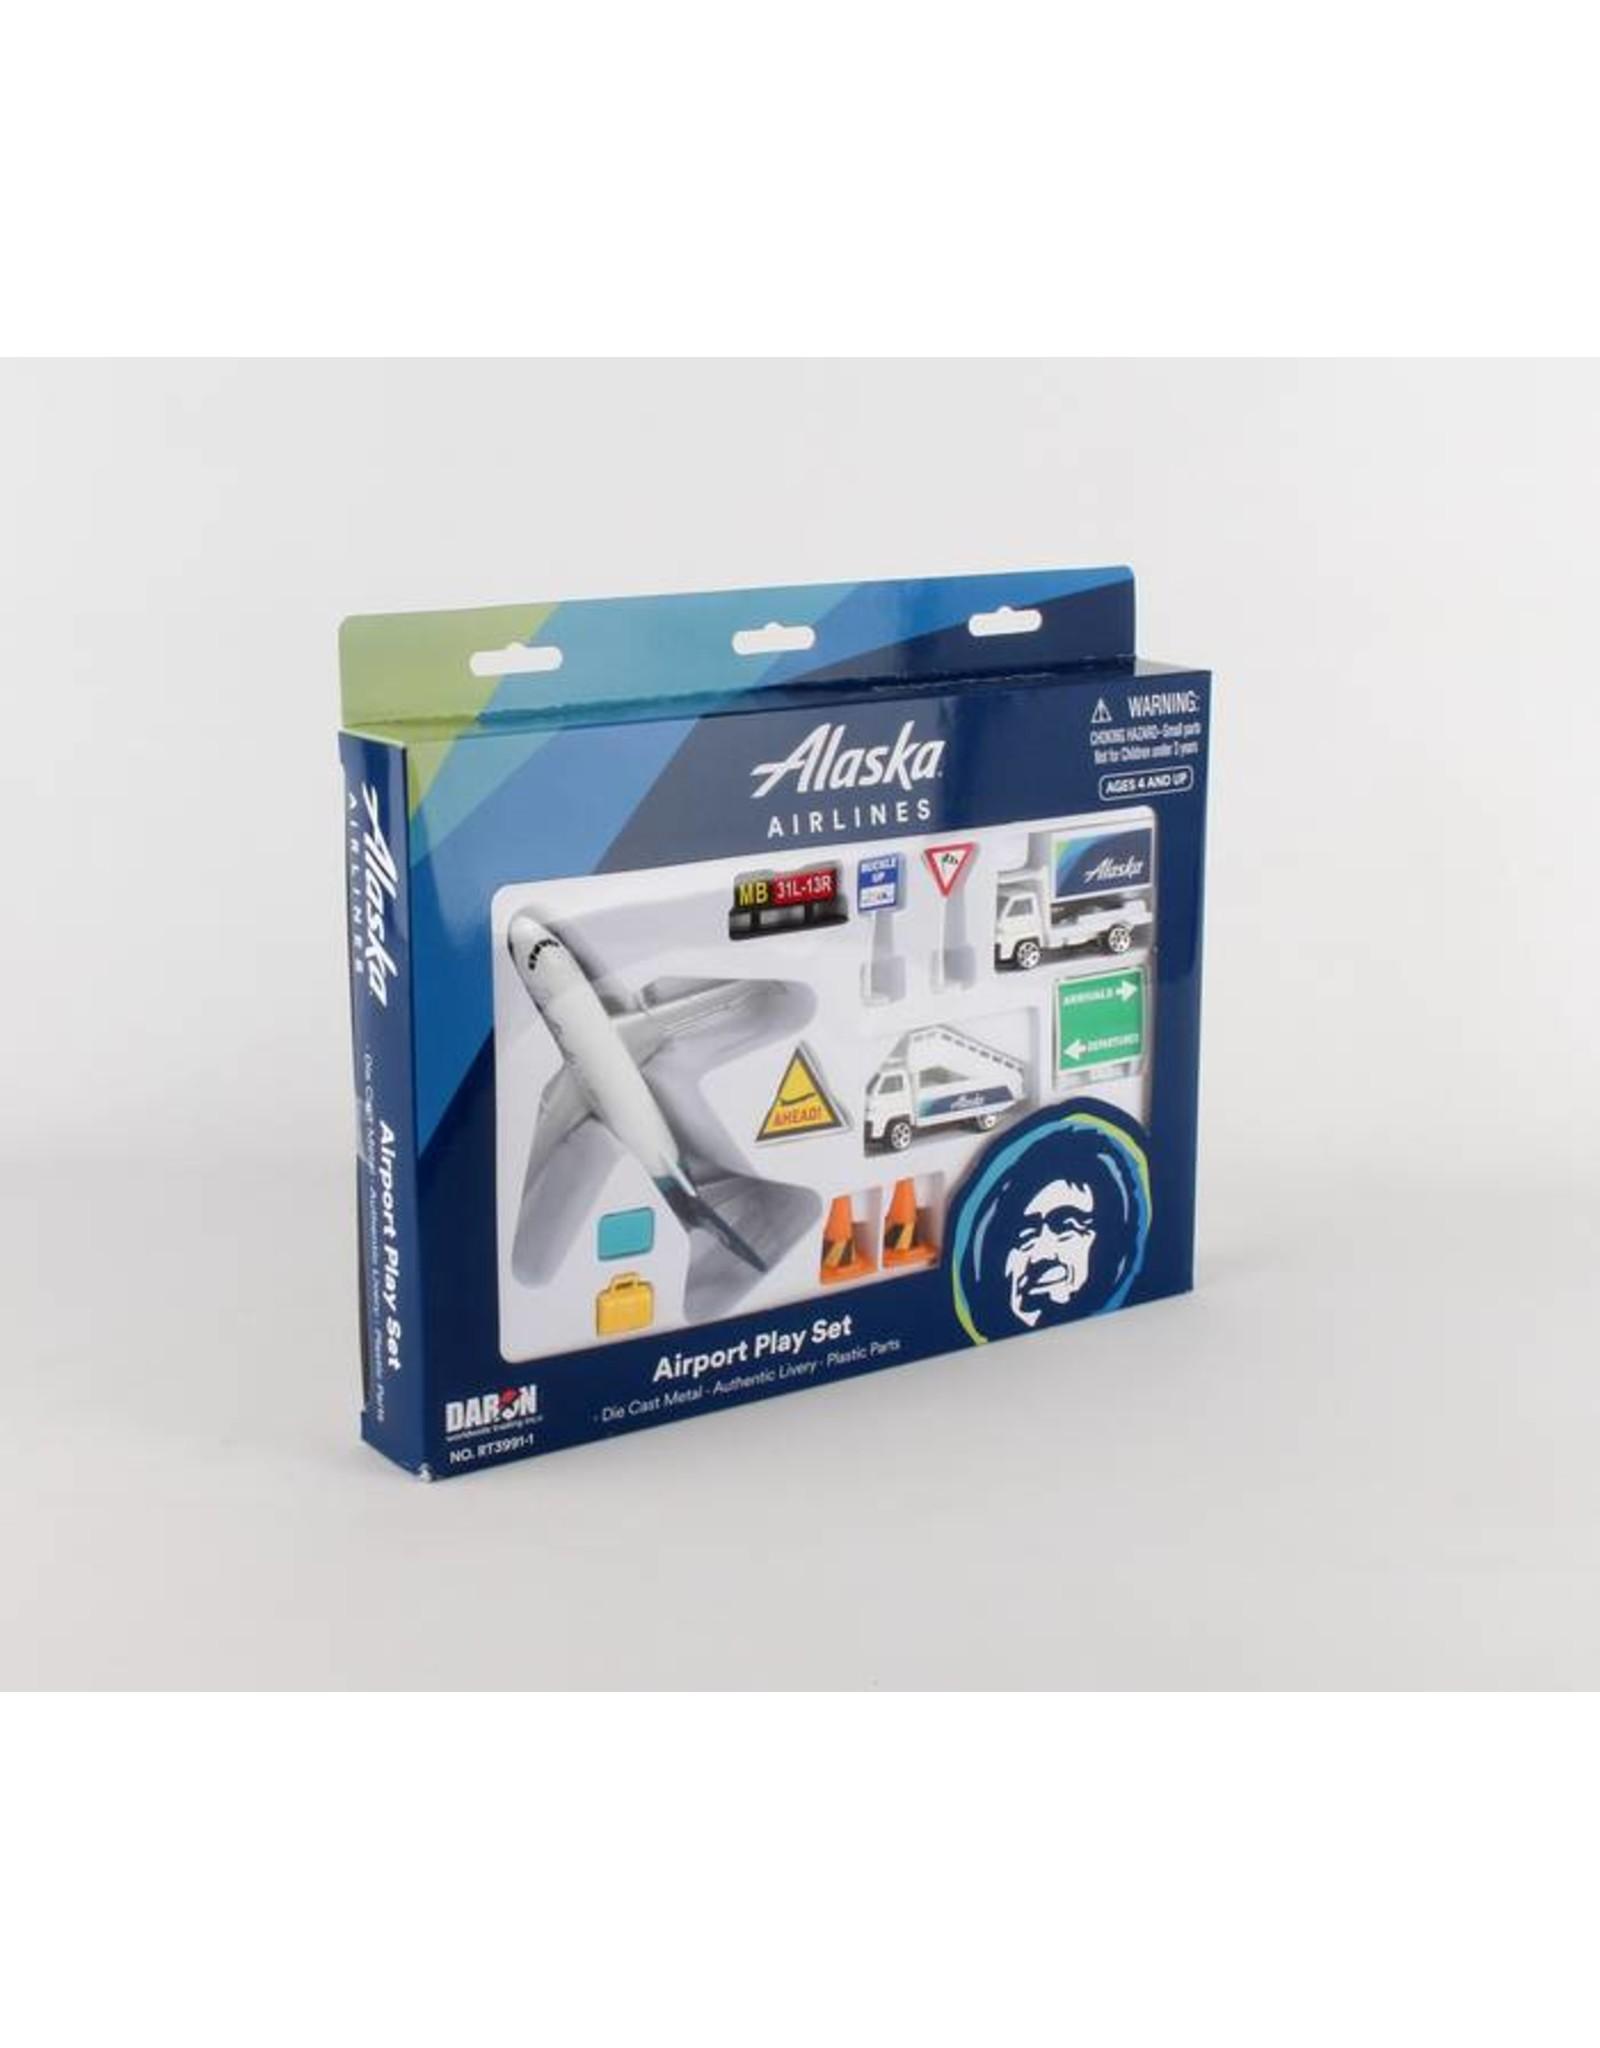 Alaska Airlines new Playset